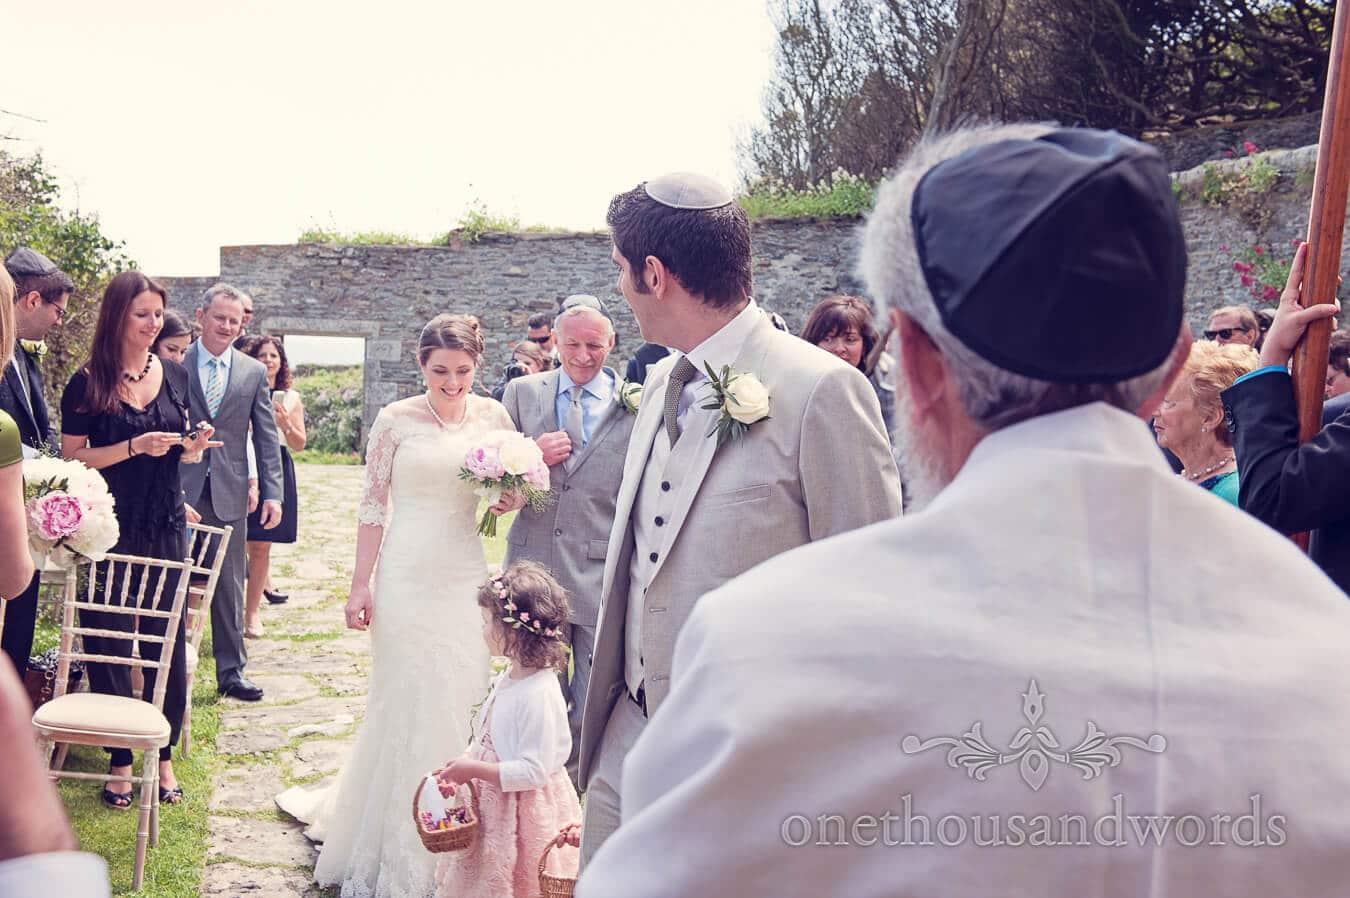 Bride walks down the aisle at outdoor Jewish wedding ceremony